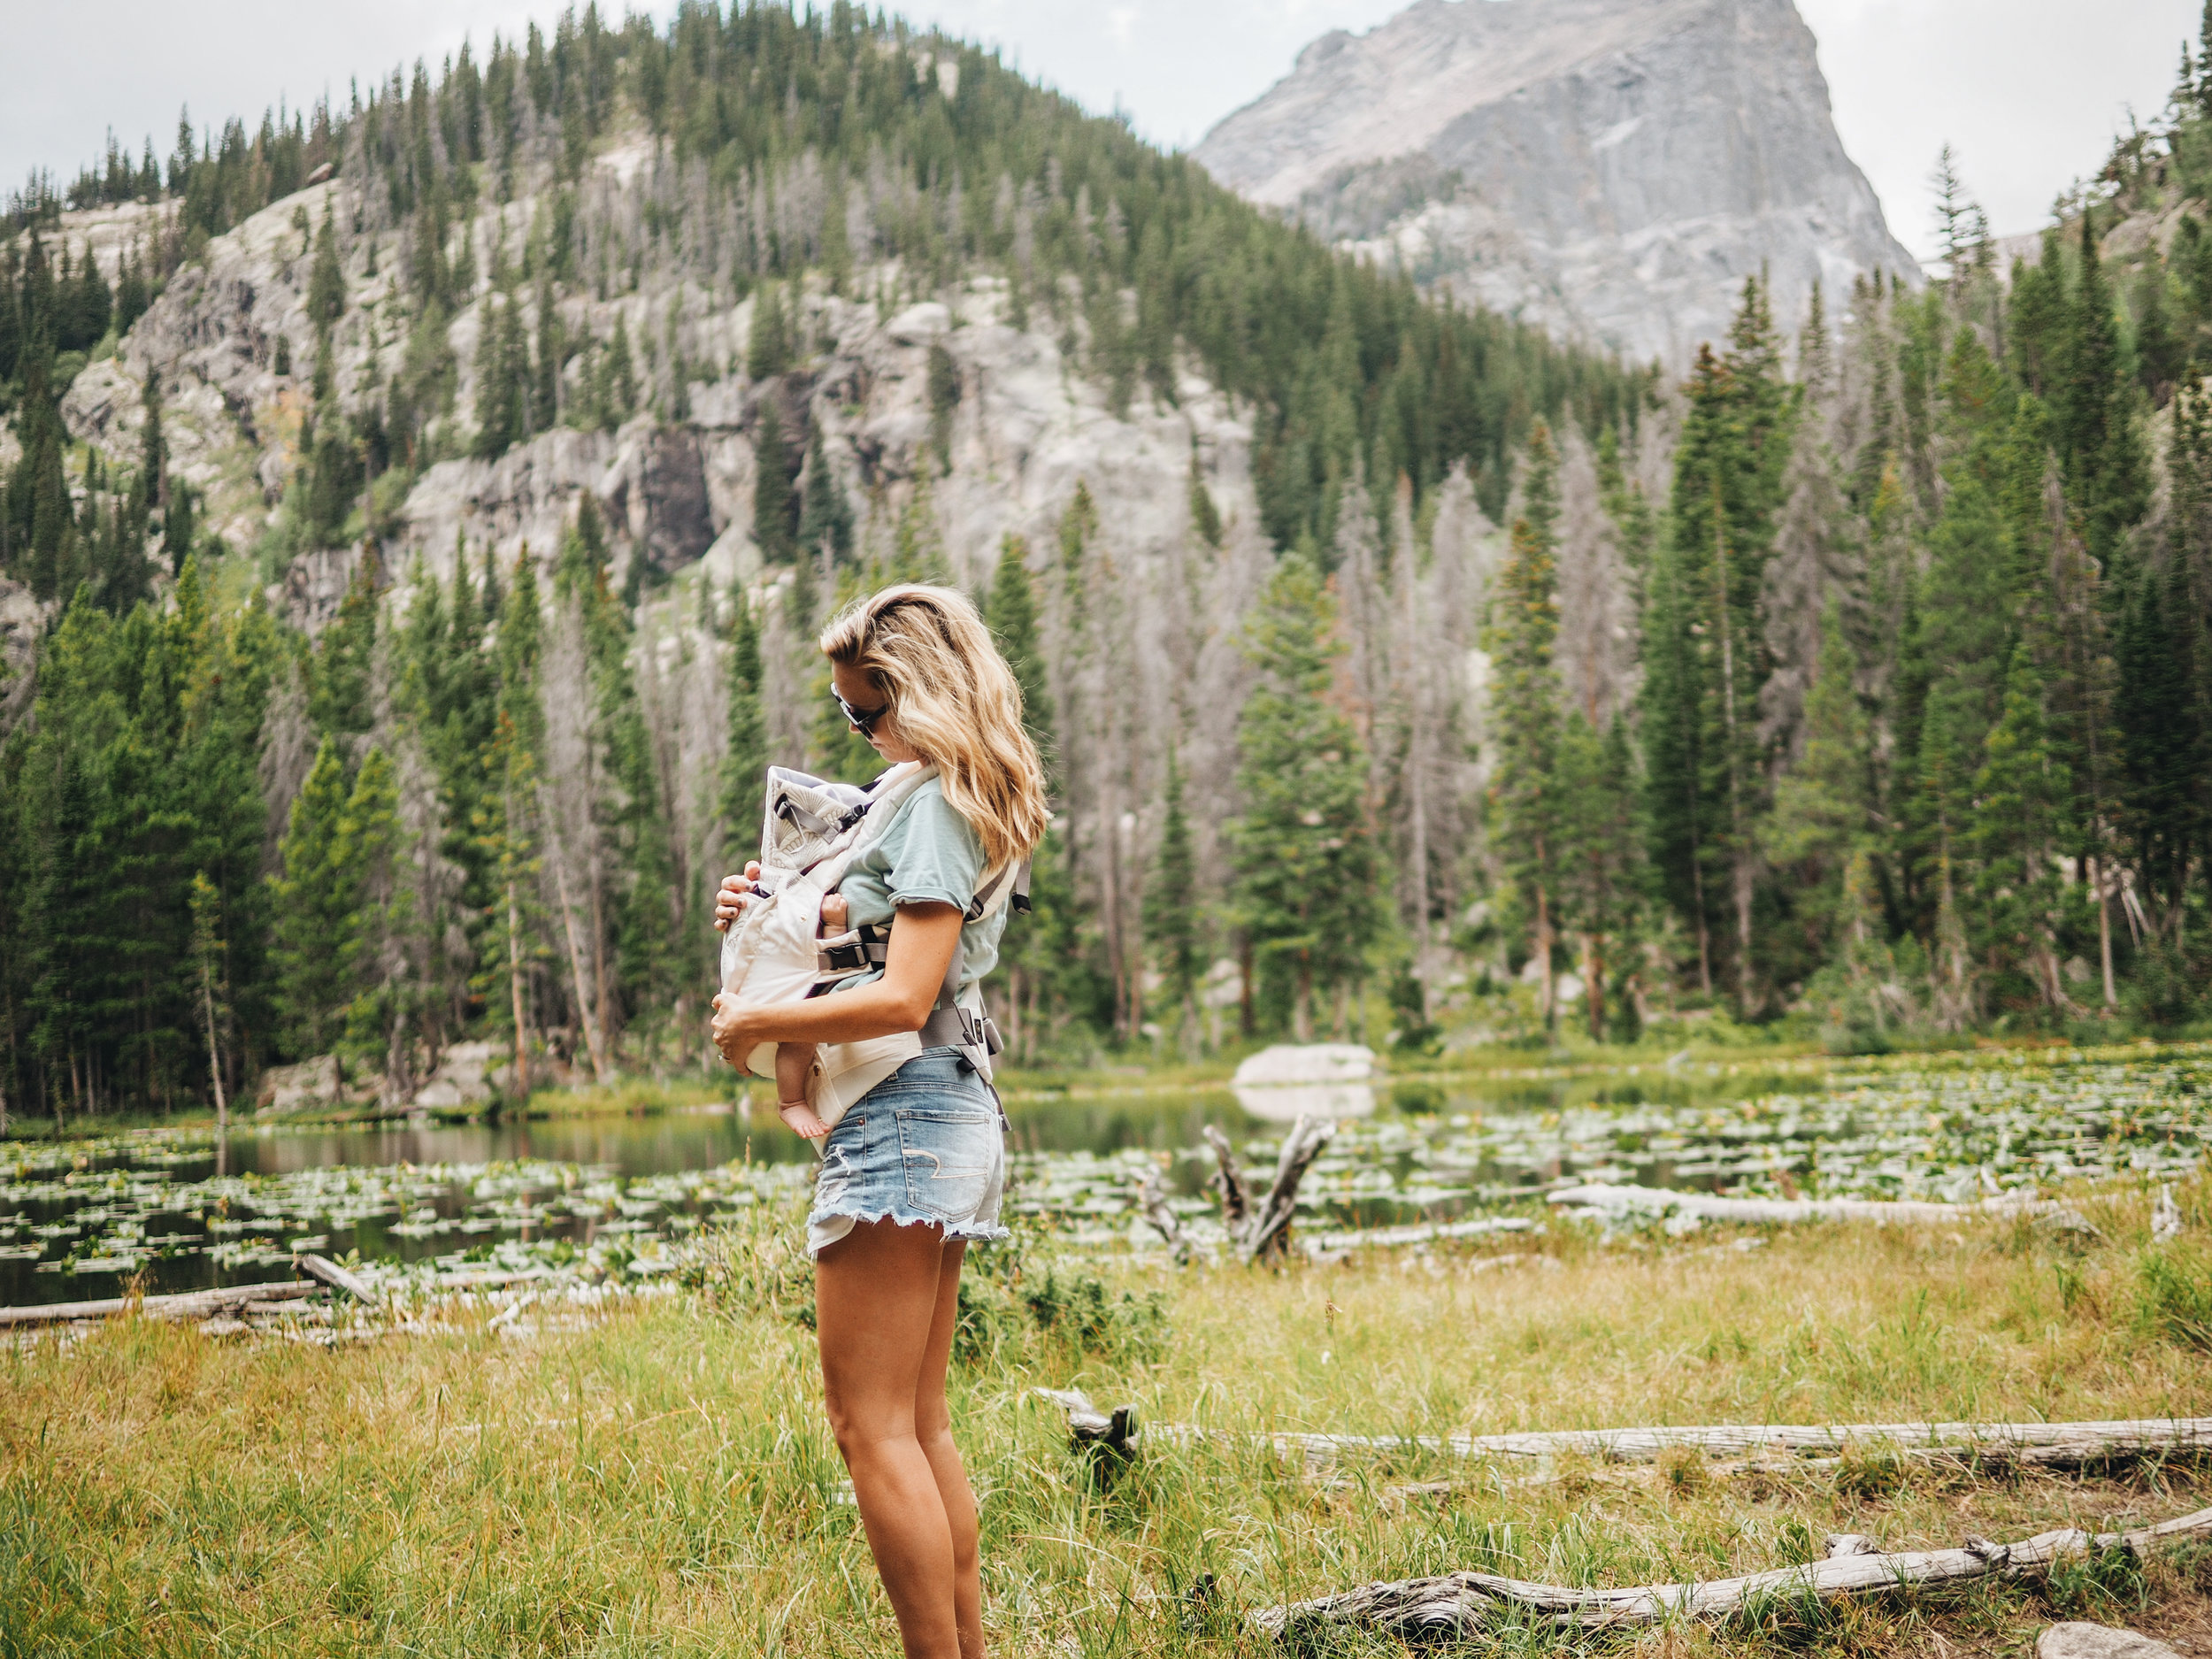 lillebaby hiking